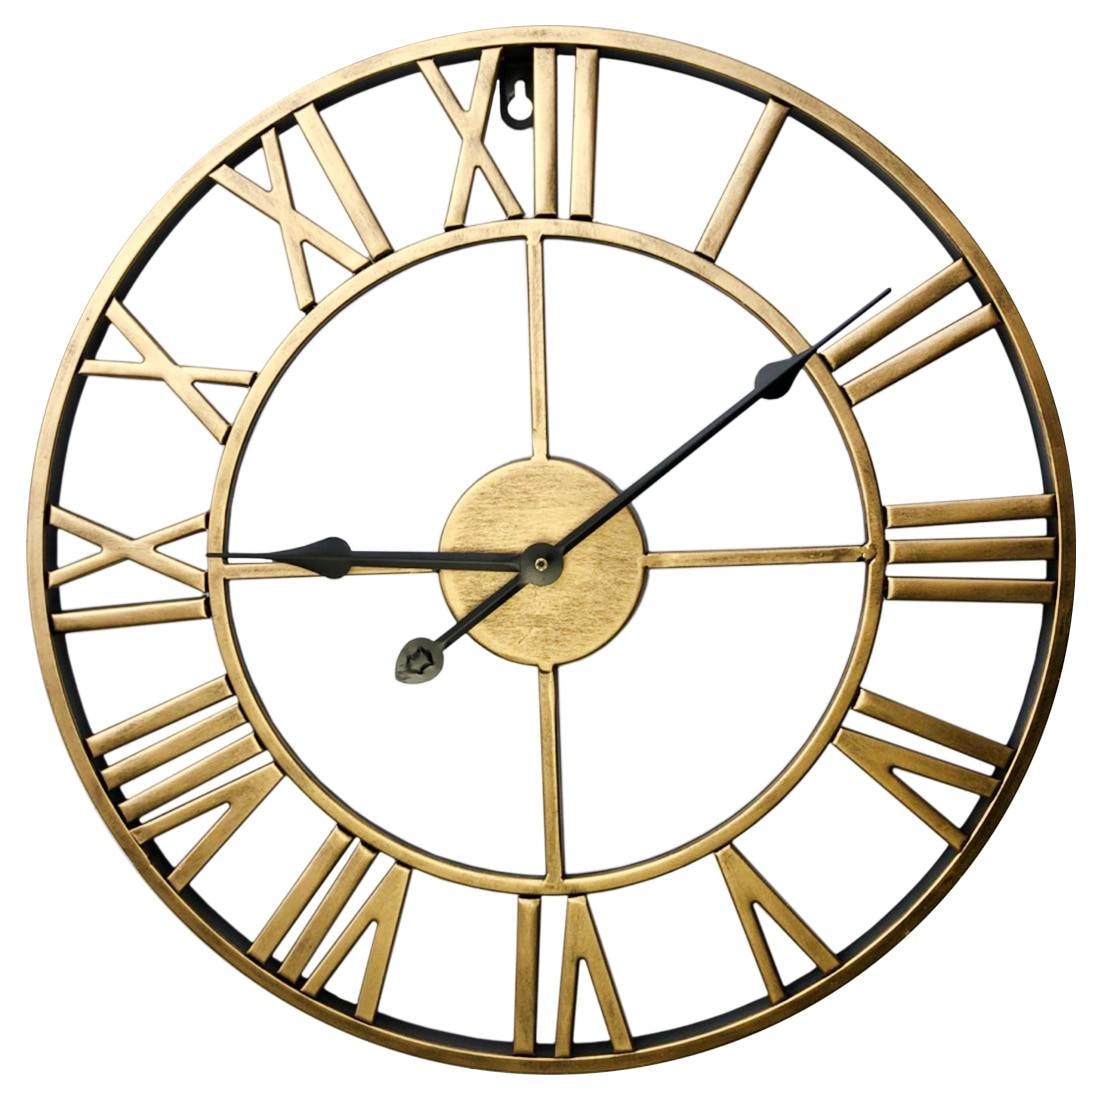 60cm Creative Wall Clock Retro Iron Roman Numerals Mute Wall Clock Battery Operated Round Wall Clock